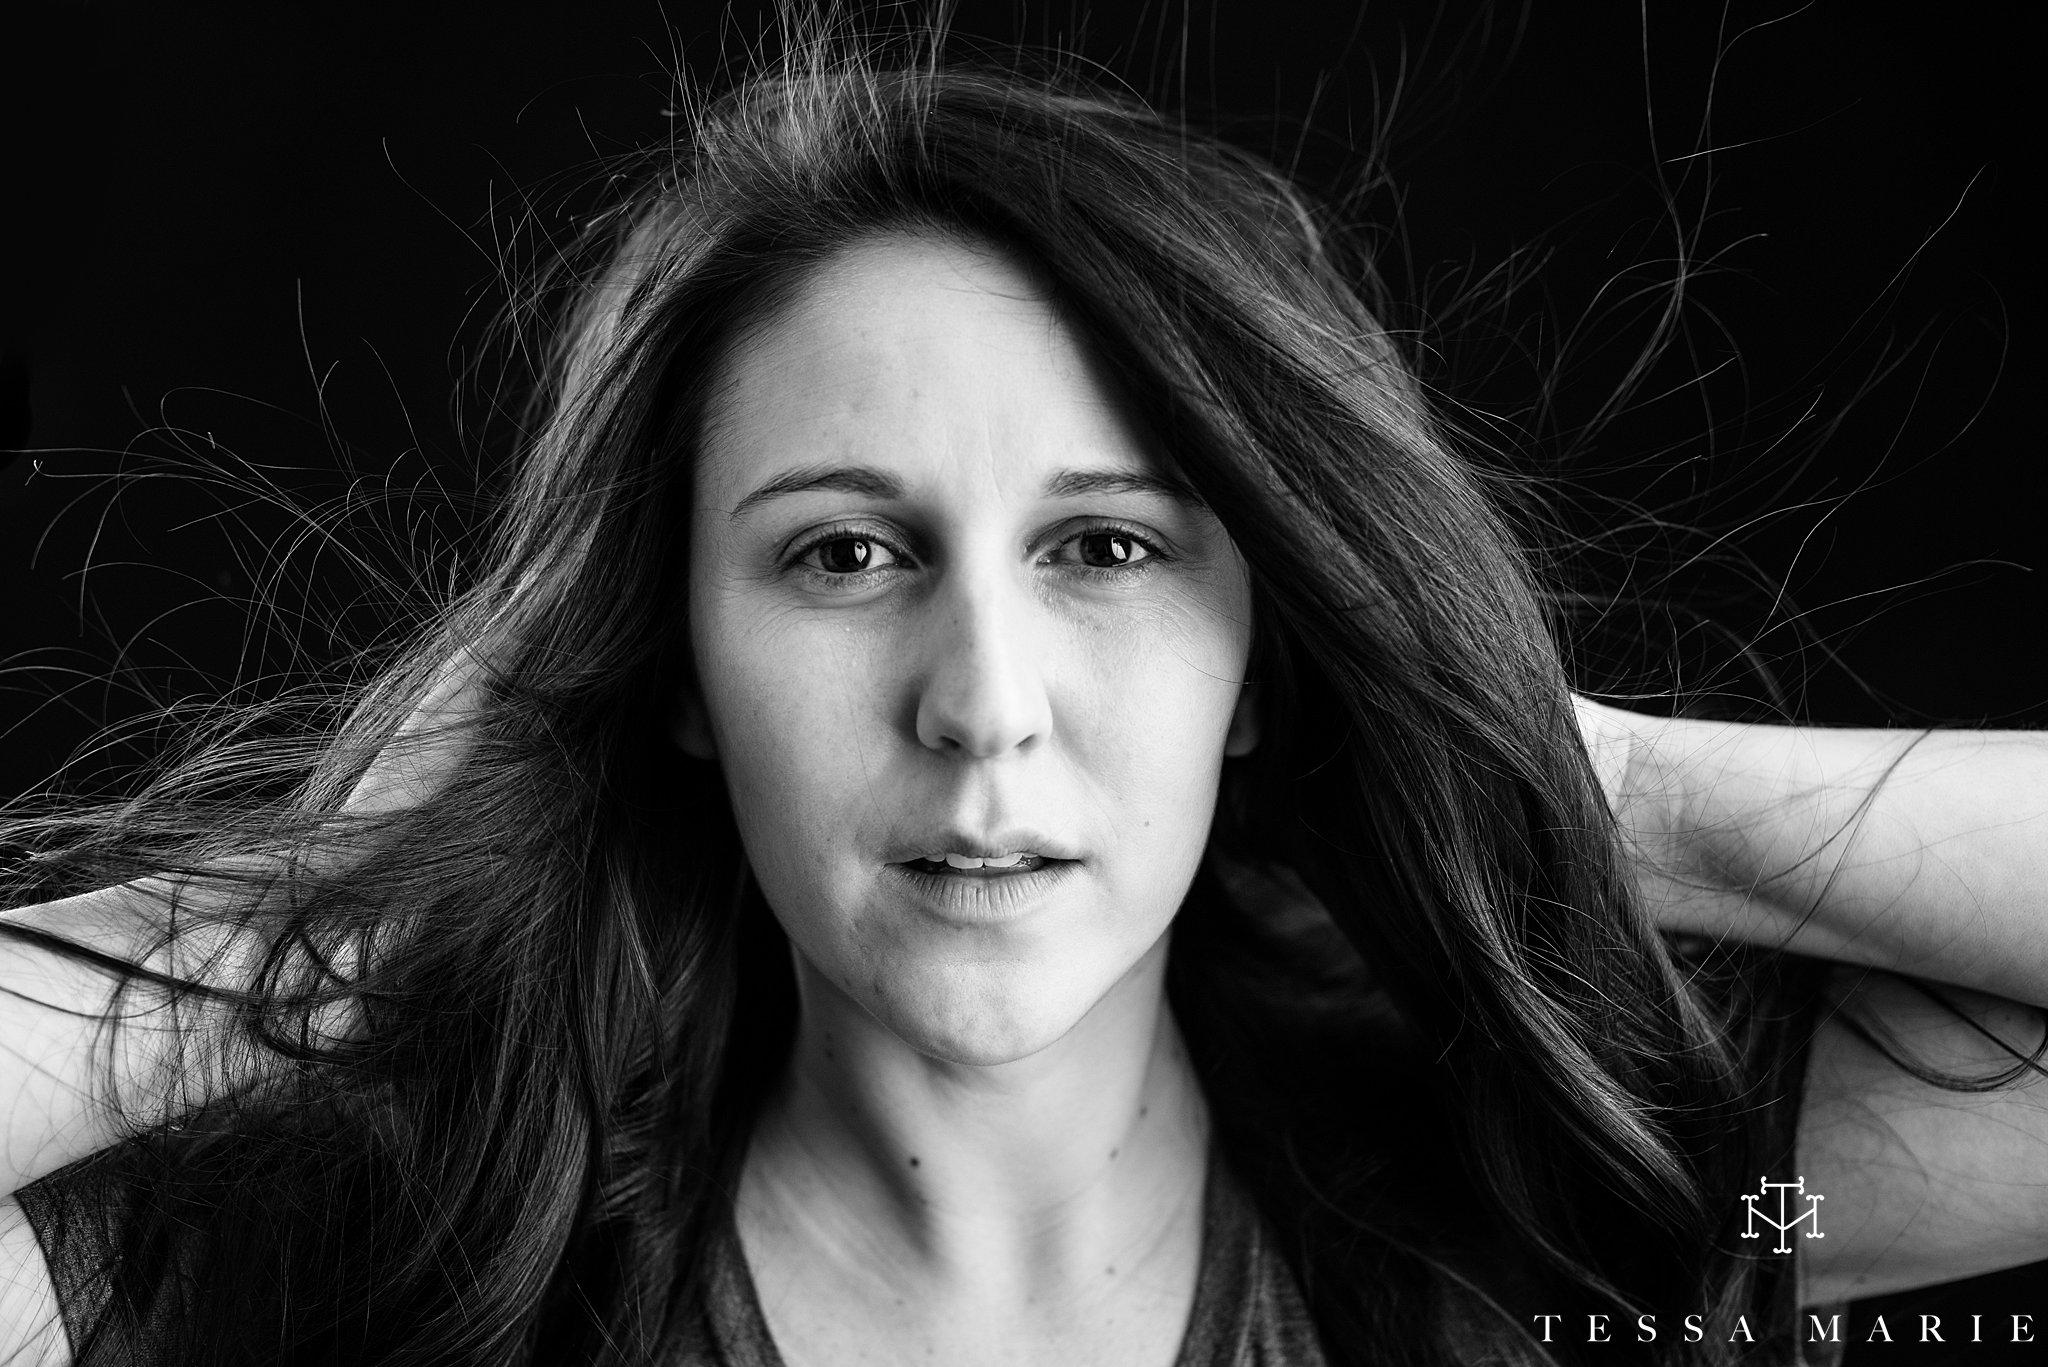 makeup_free_womens_portraits_tessa_marie_studios_no_makeup_empowering_women_0005.jpg